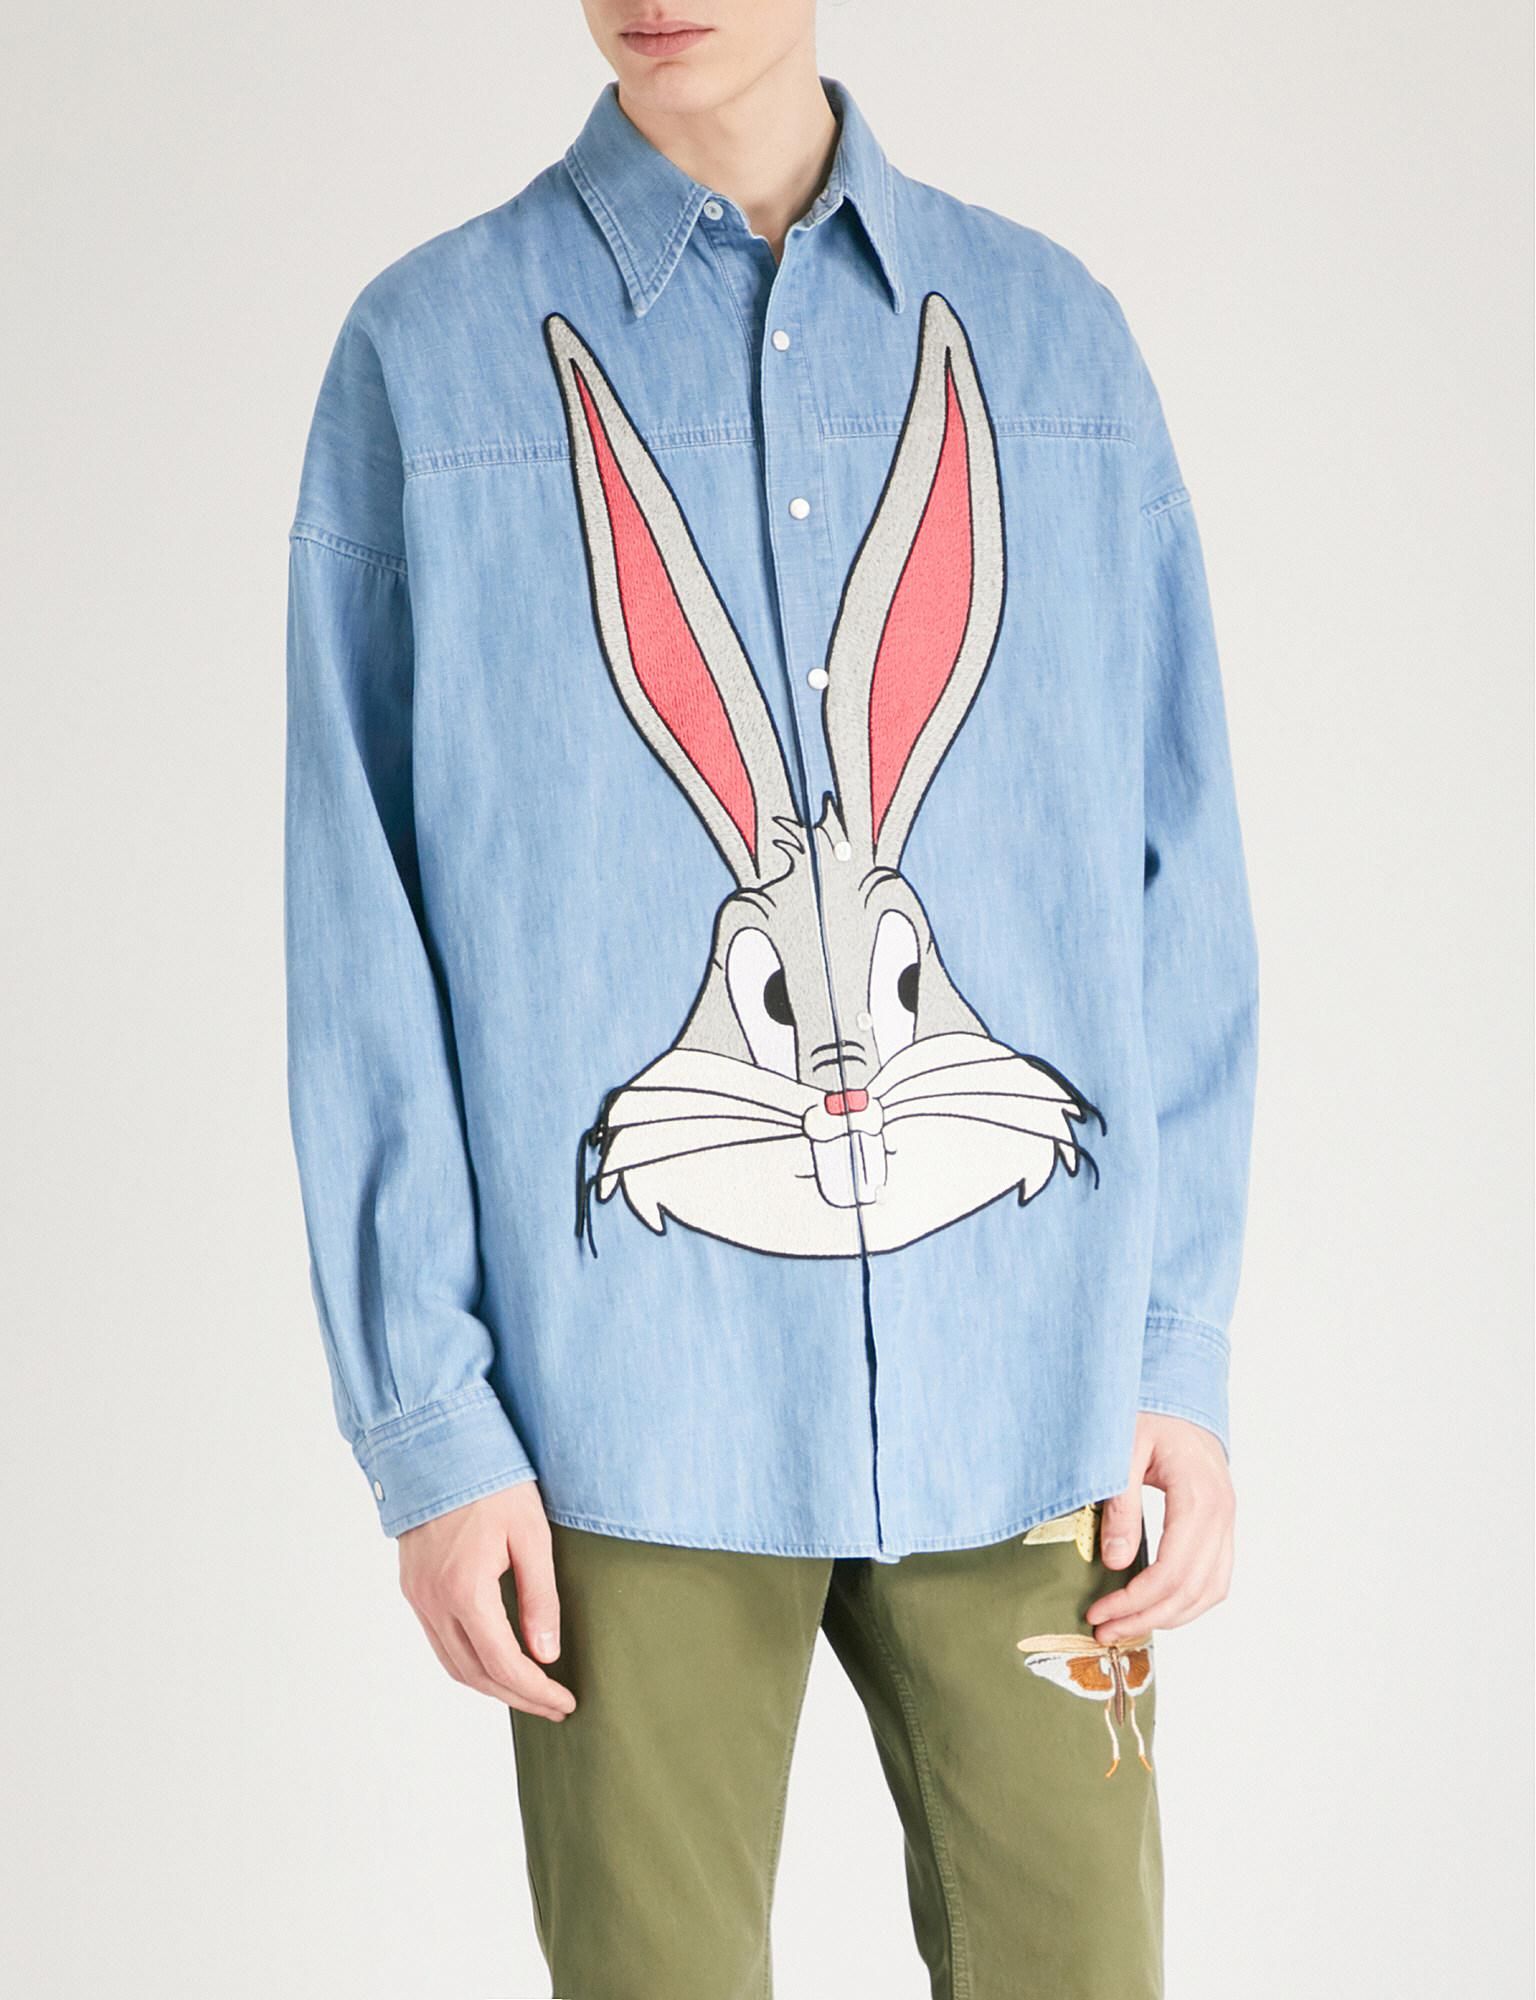 24f8121c852 Gucci Bugs Bunny Regular-fit Denim Shirt in Blue for Men - Lyst